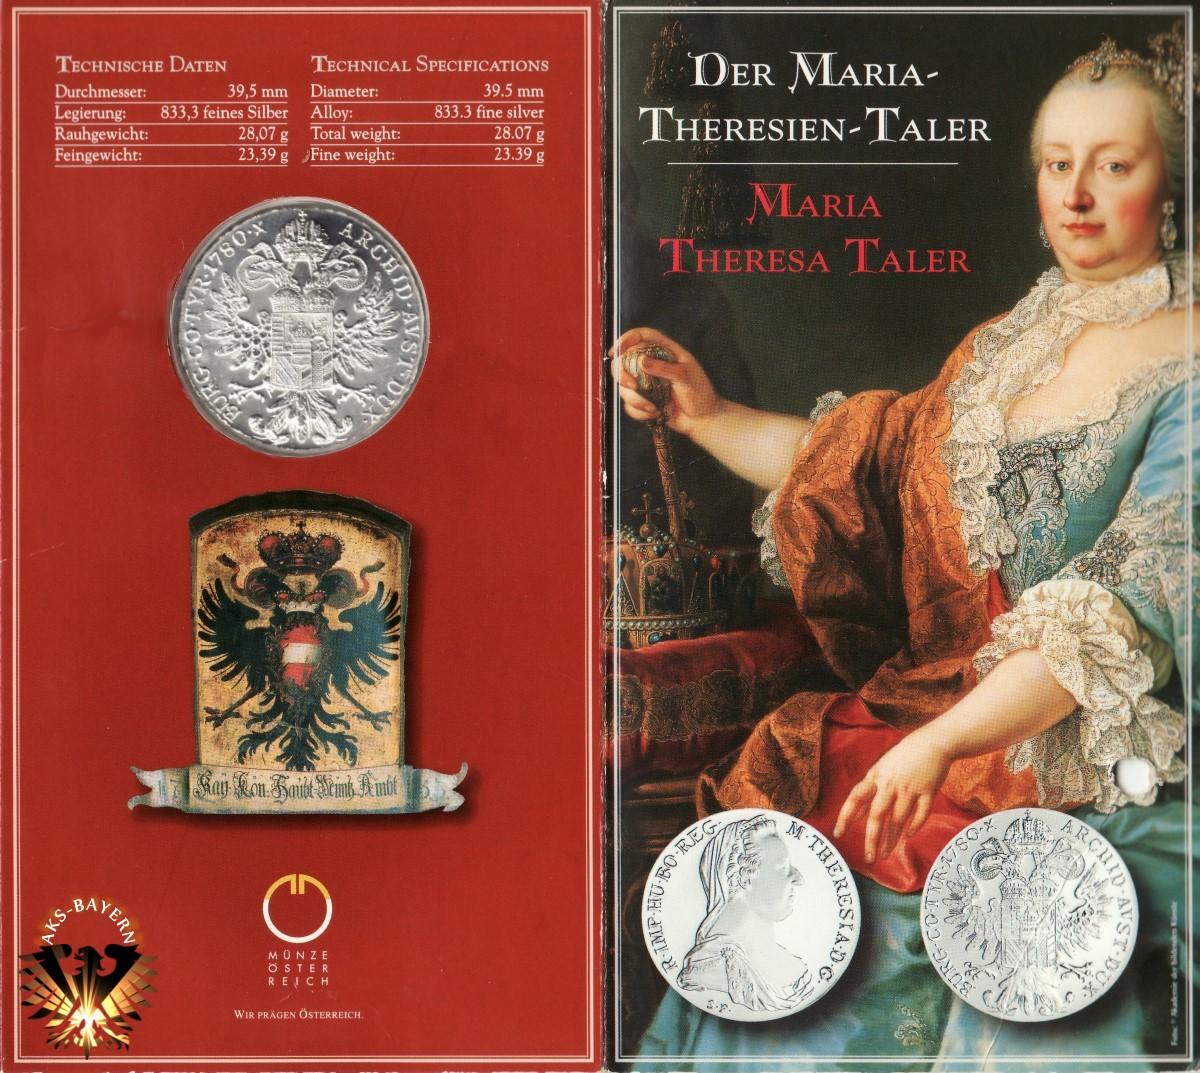 Maria Theresien Taler